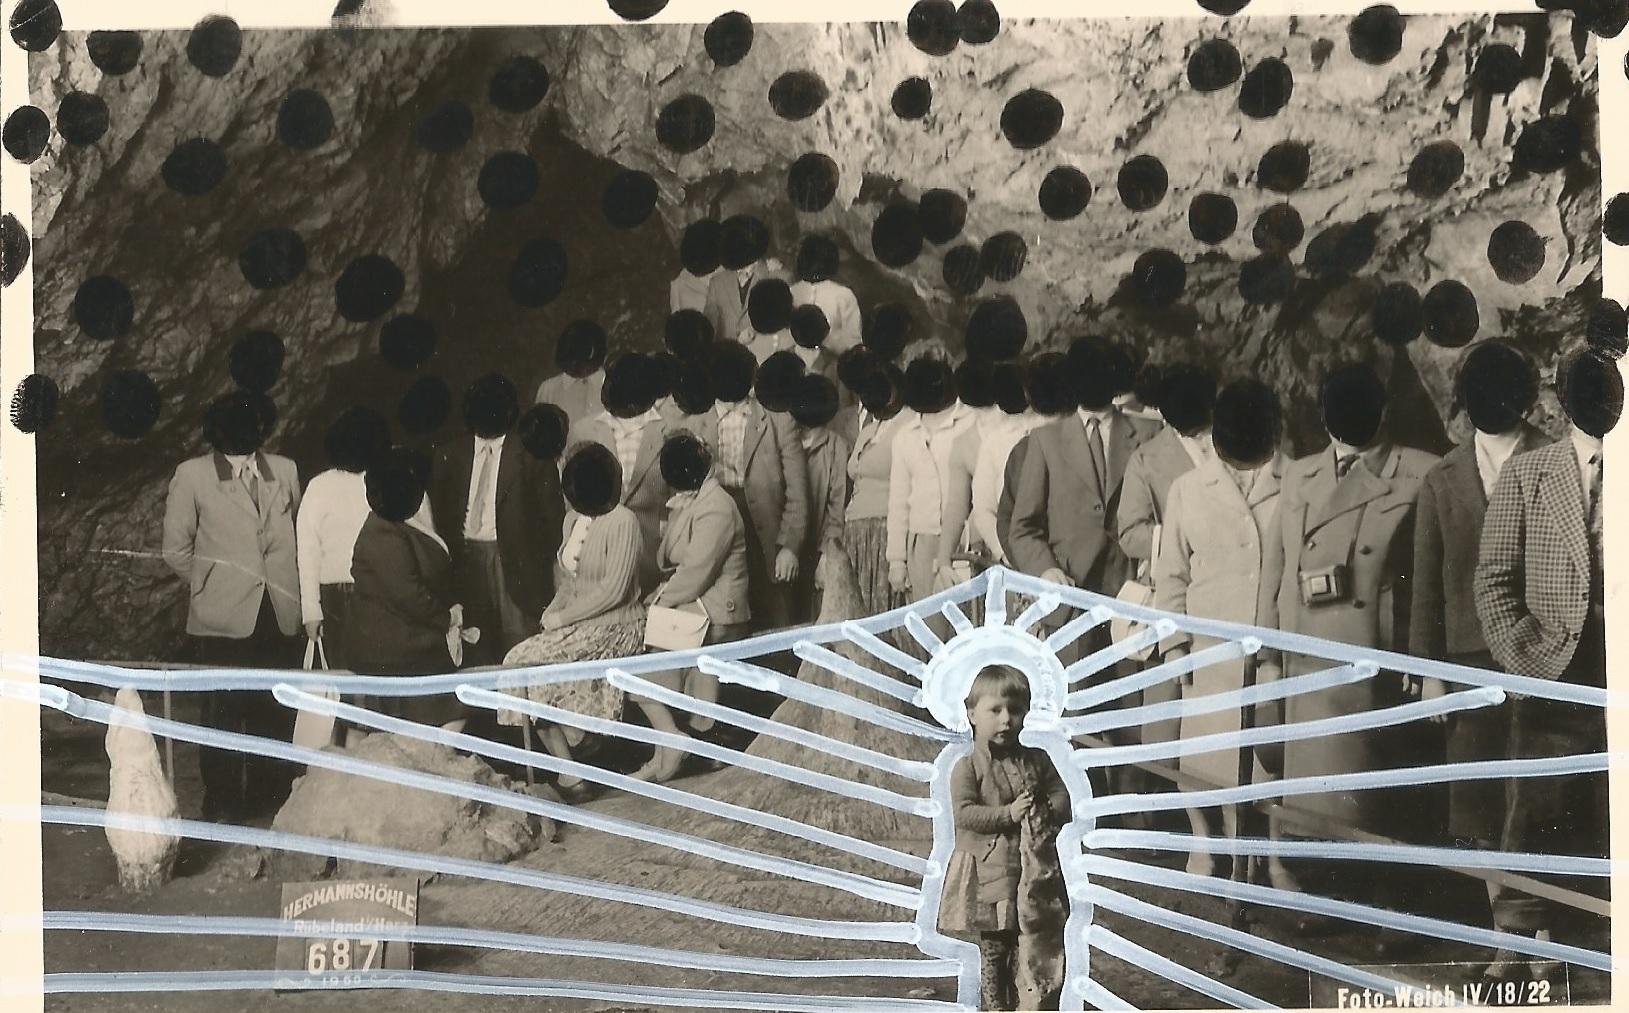 Sofia Mansuri, #messias, Pigmentliner und Edding auf Fotopapier, 2020